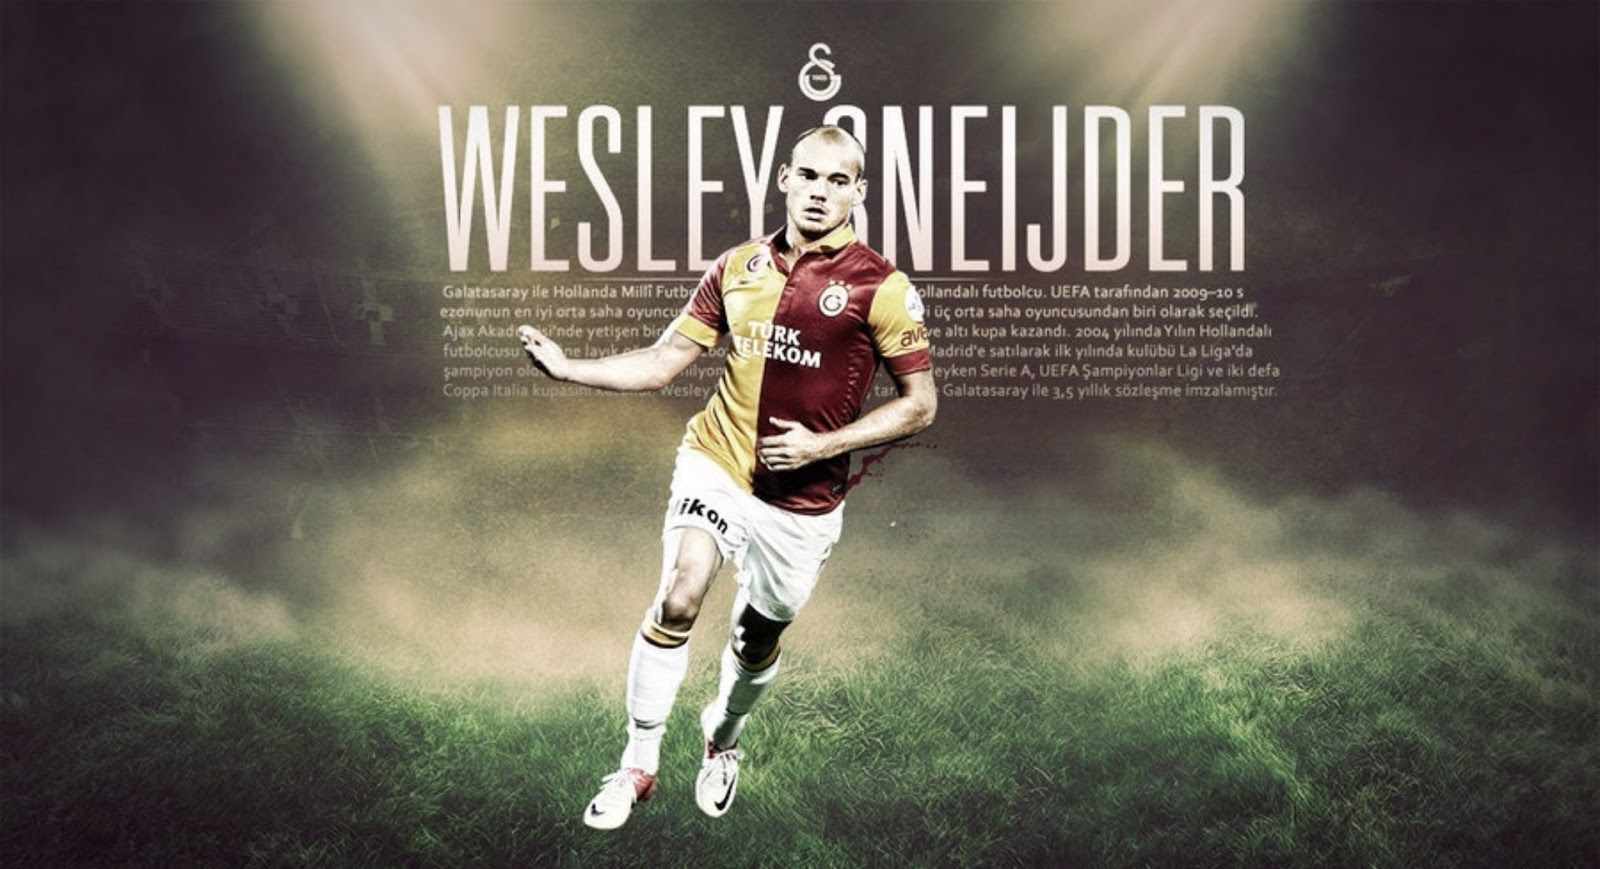 wesley+sneijder+galatasaray+resimleri+rooteto+3 Wesley Sneijder Galatasaray HD Resimleri